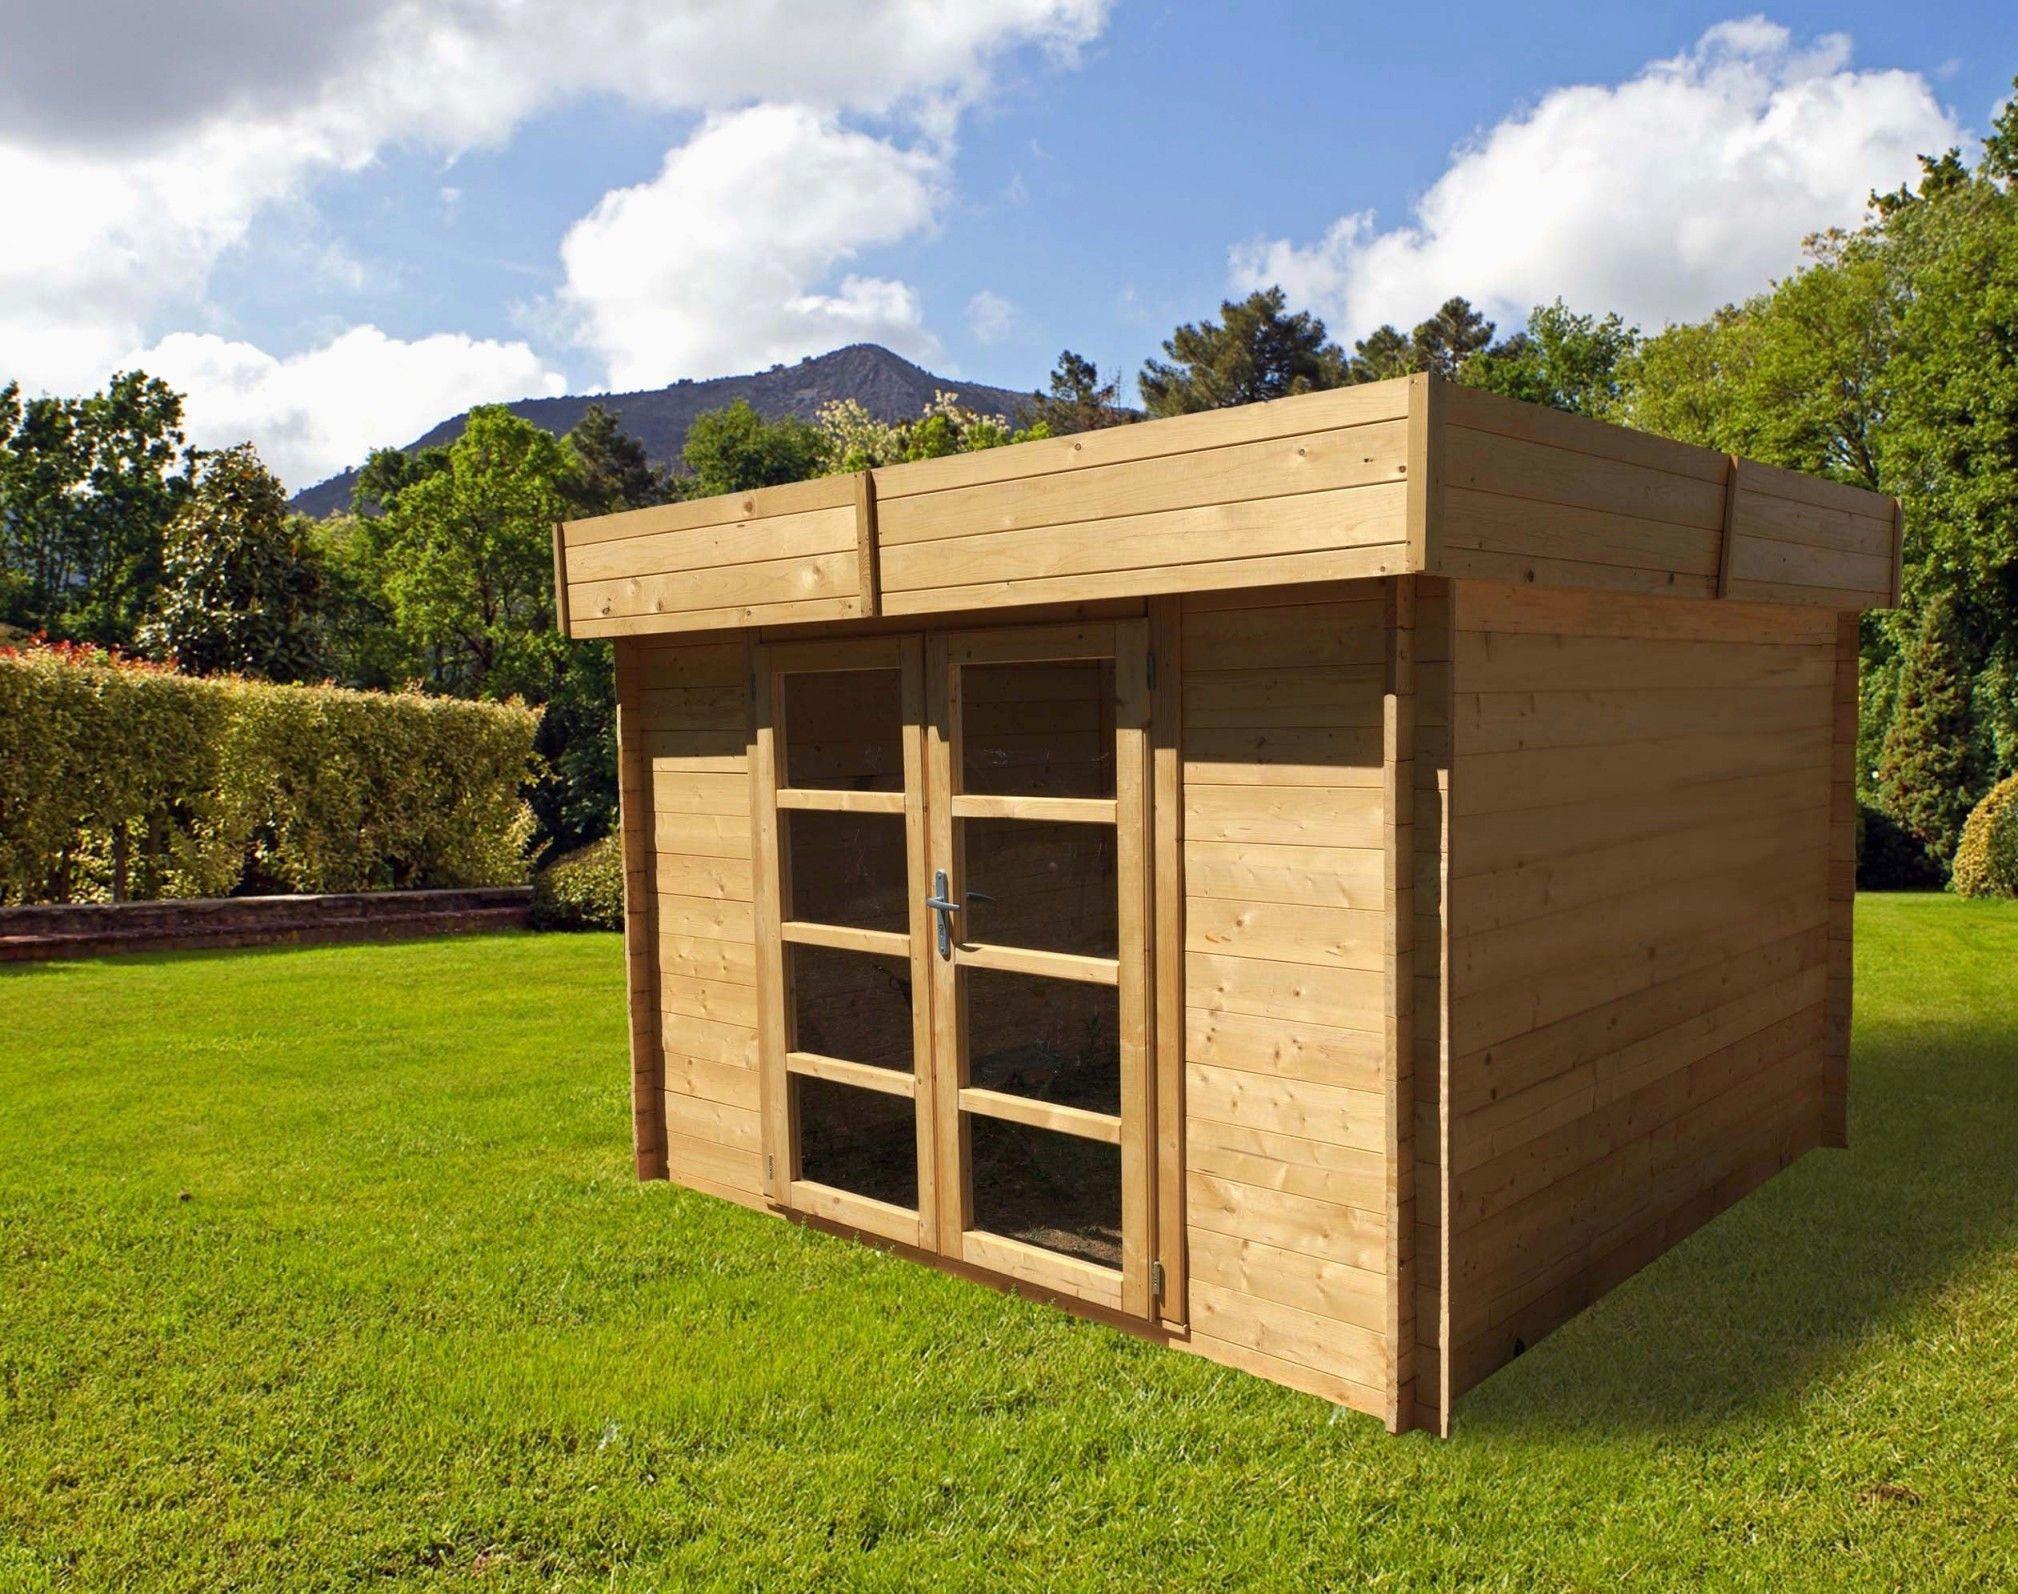 Fresh Chalet De Jardin Castorama | Construire Abri De Jardin ... tout Chalet De Jardin Castorama